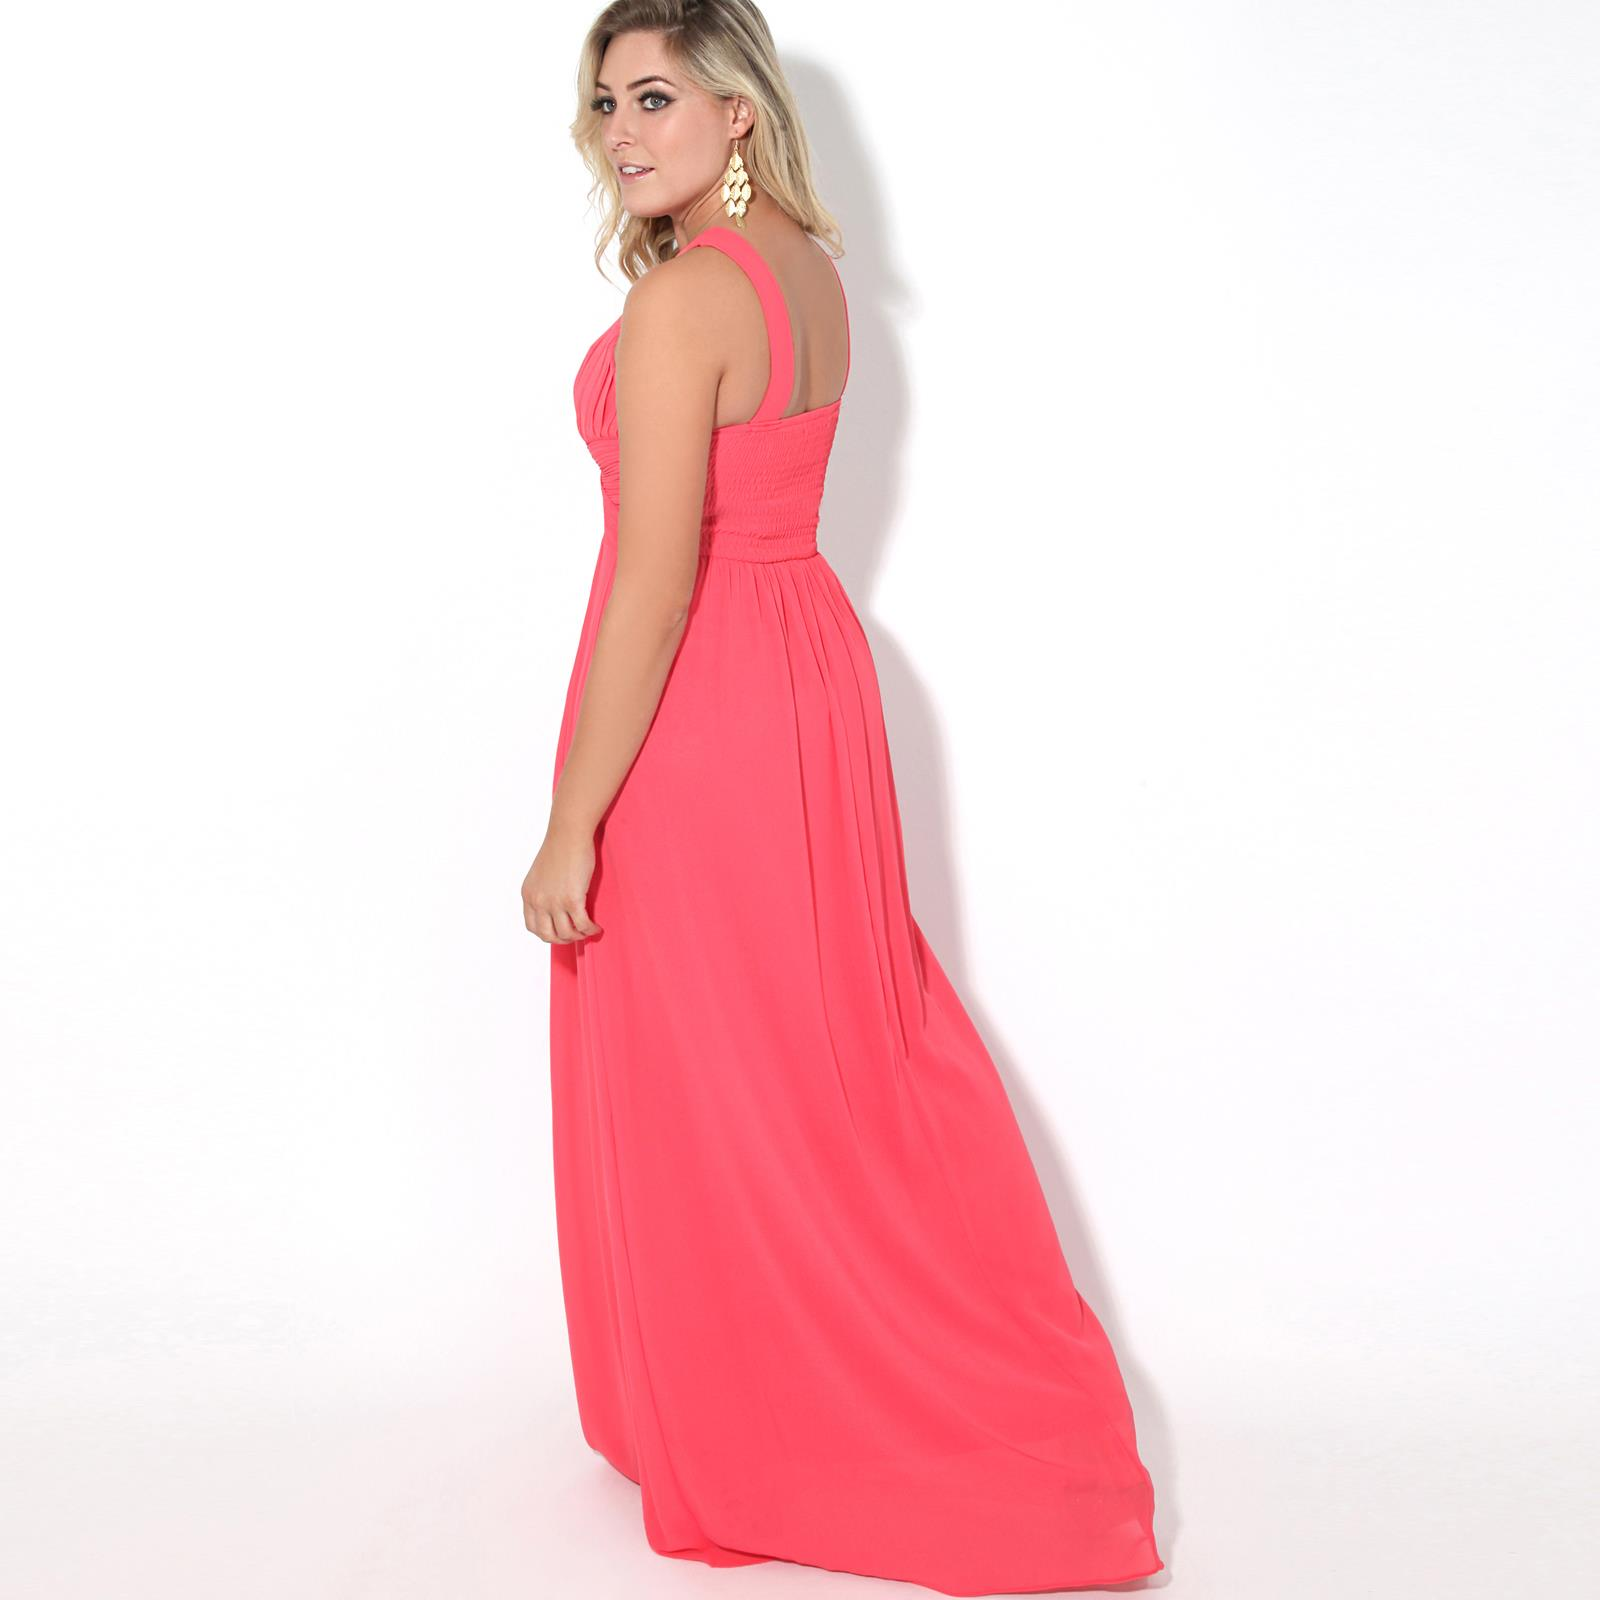 Women-Ladies-Long-Cocktail-Wedding-Bridesmaid-Evening-Maxi-Dress-Formal-Gown thumbnail 8